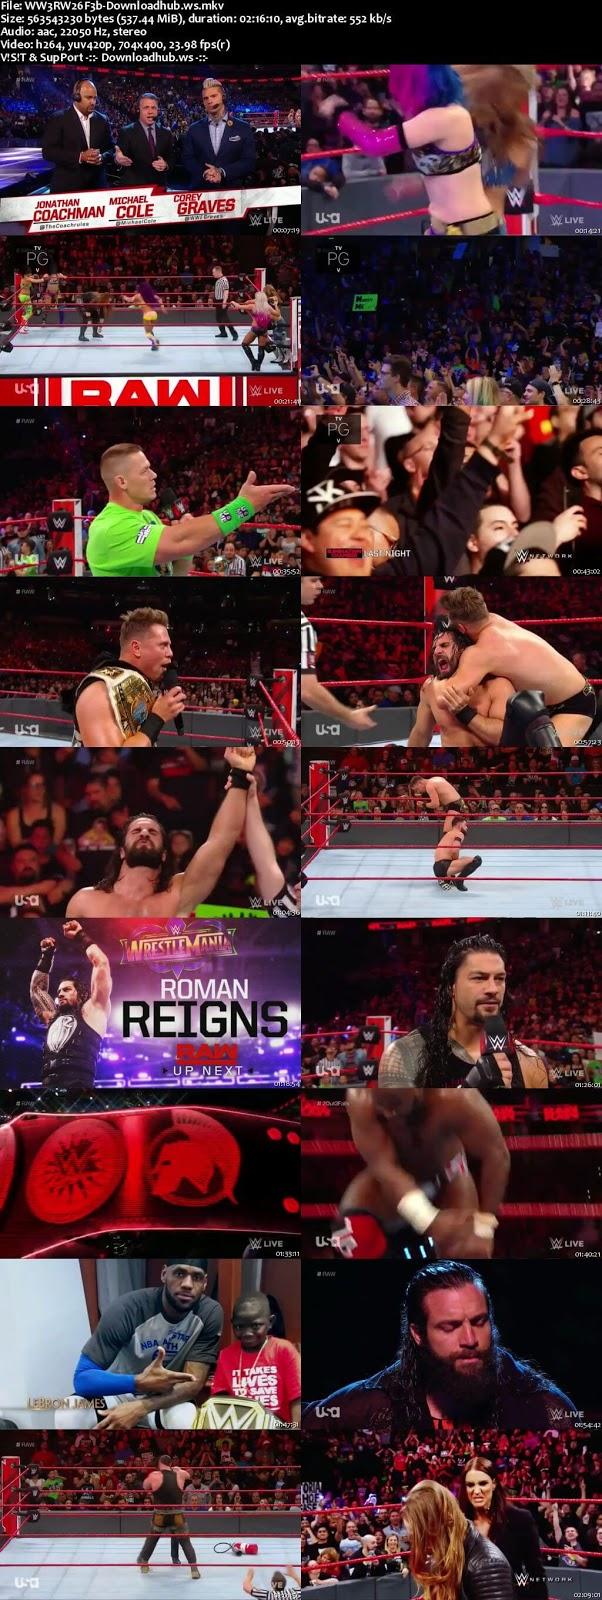 WWE Monday Night Raw 26 February 2018 480p HDTV Download